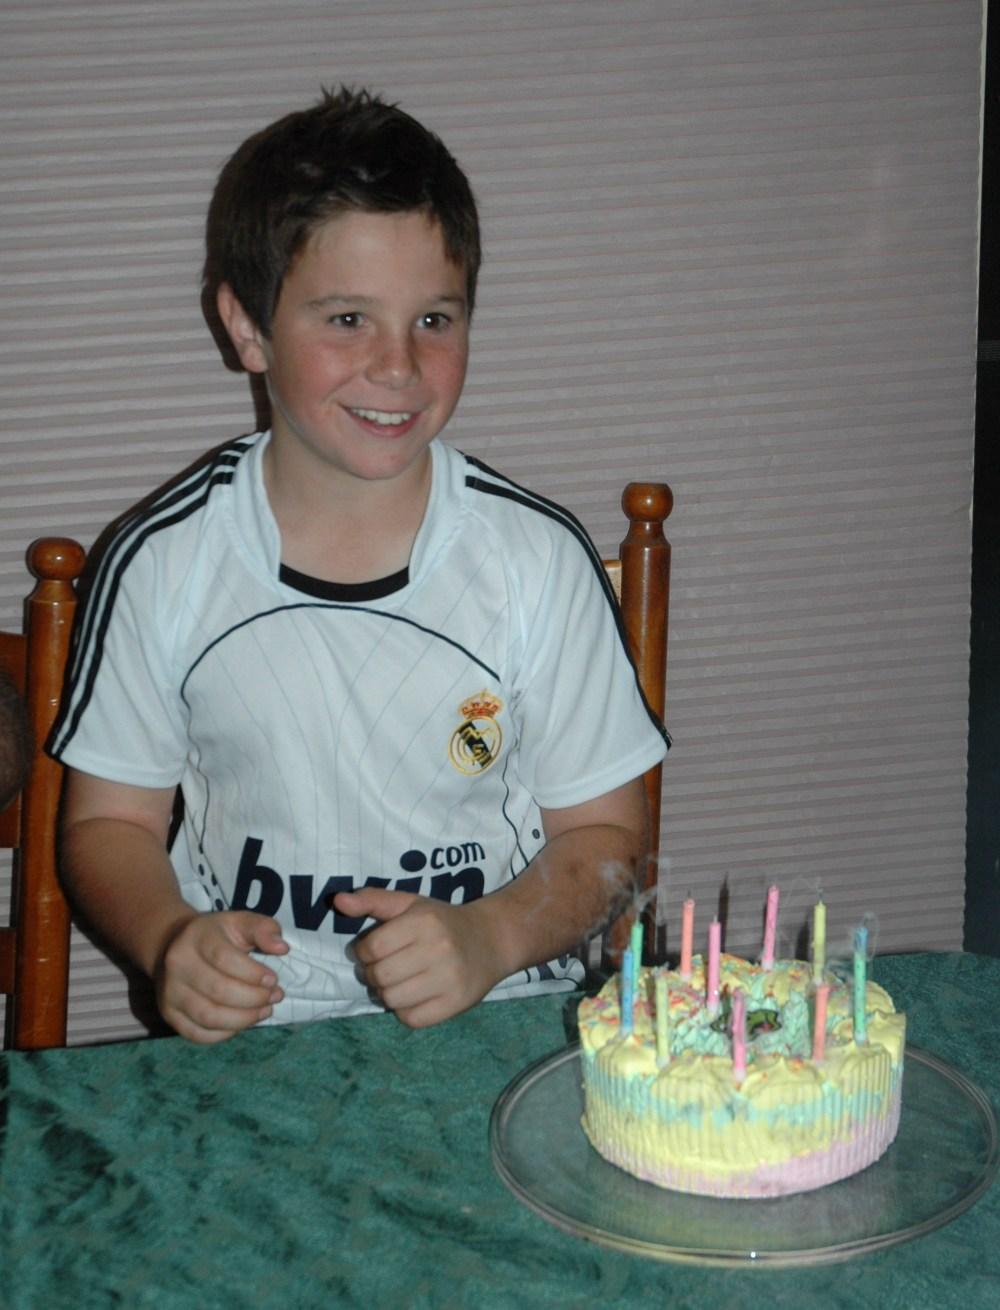 Sandy turns 11